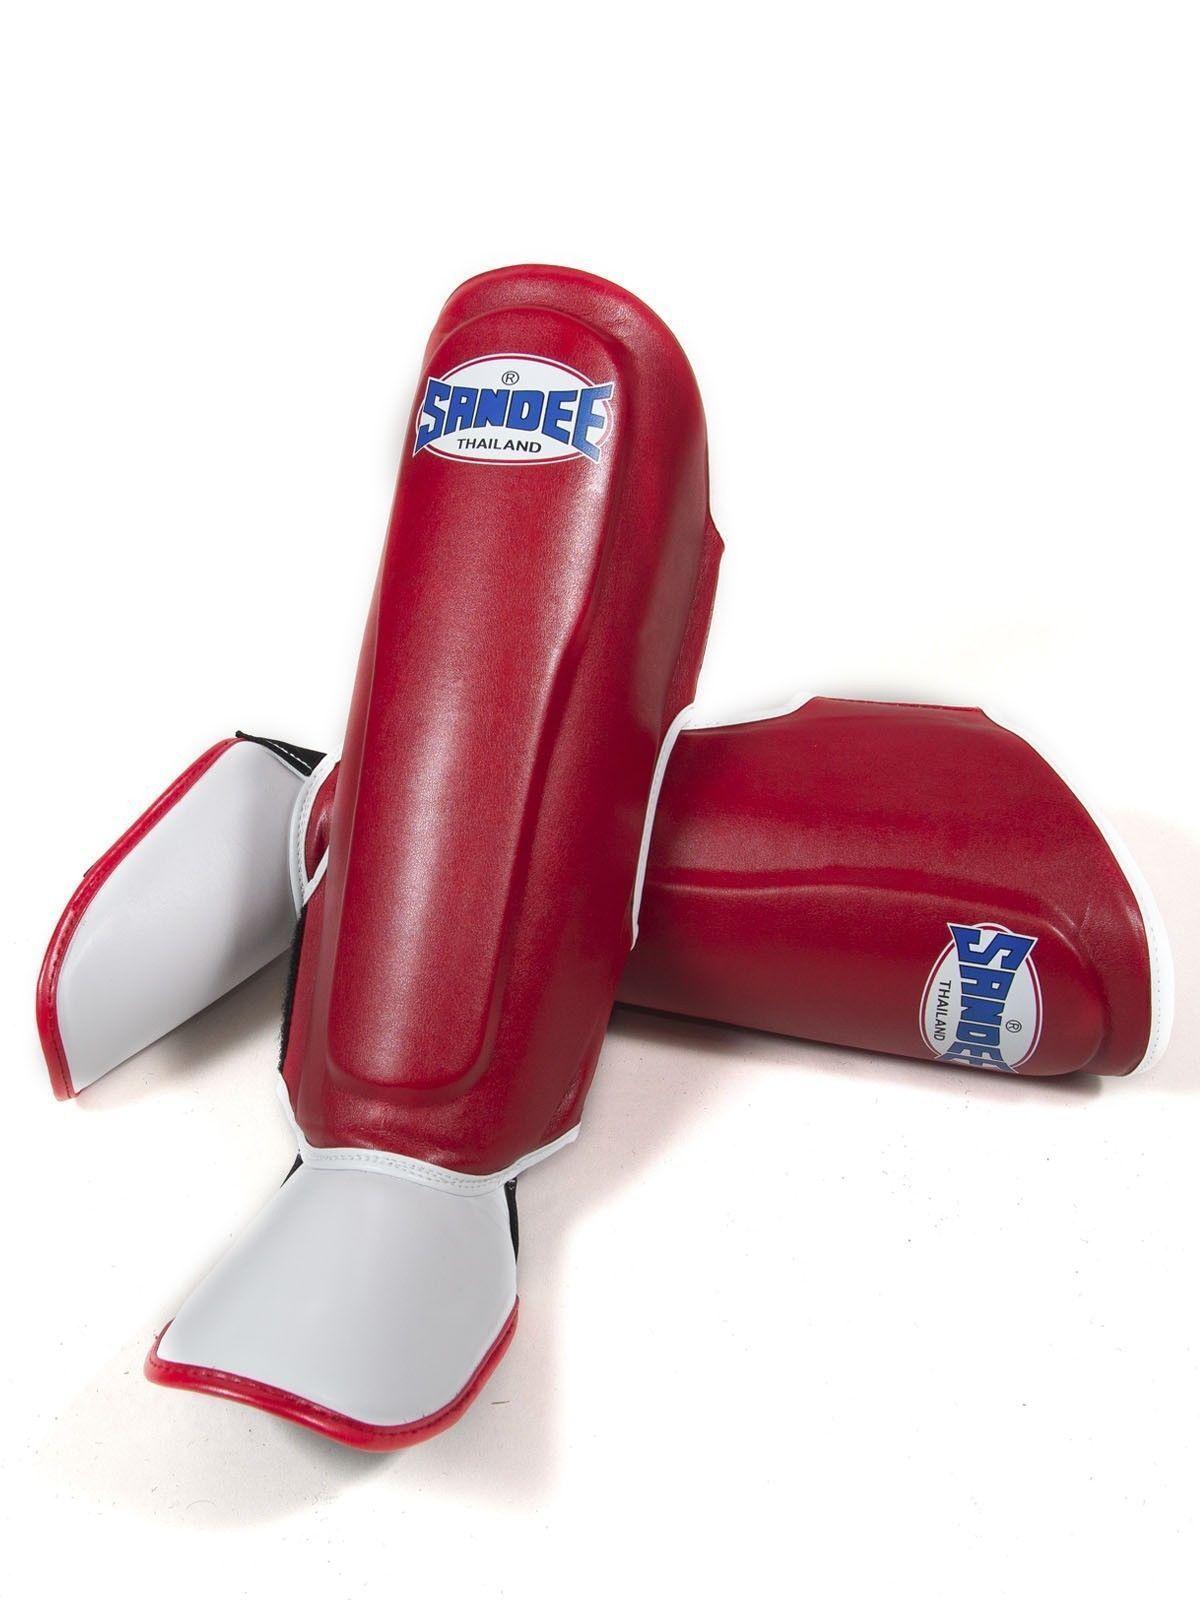 SANDEE AUTHENTIC rosso in pelle Guardie sintetica stivali Shin Guardie pelle MUAY-THAI BOXING-Kids 502bf8